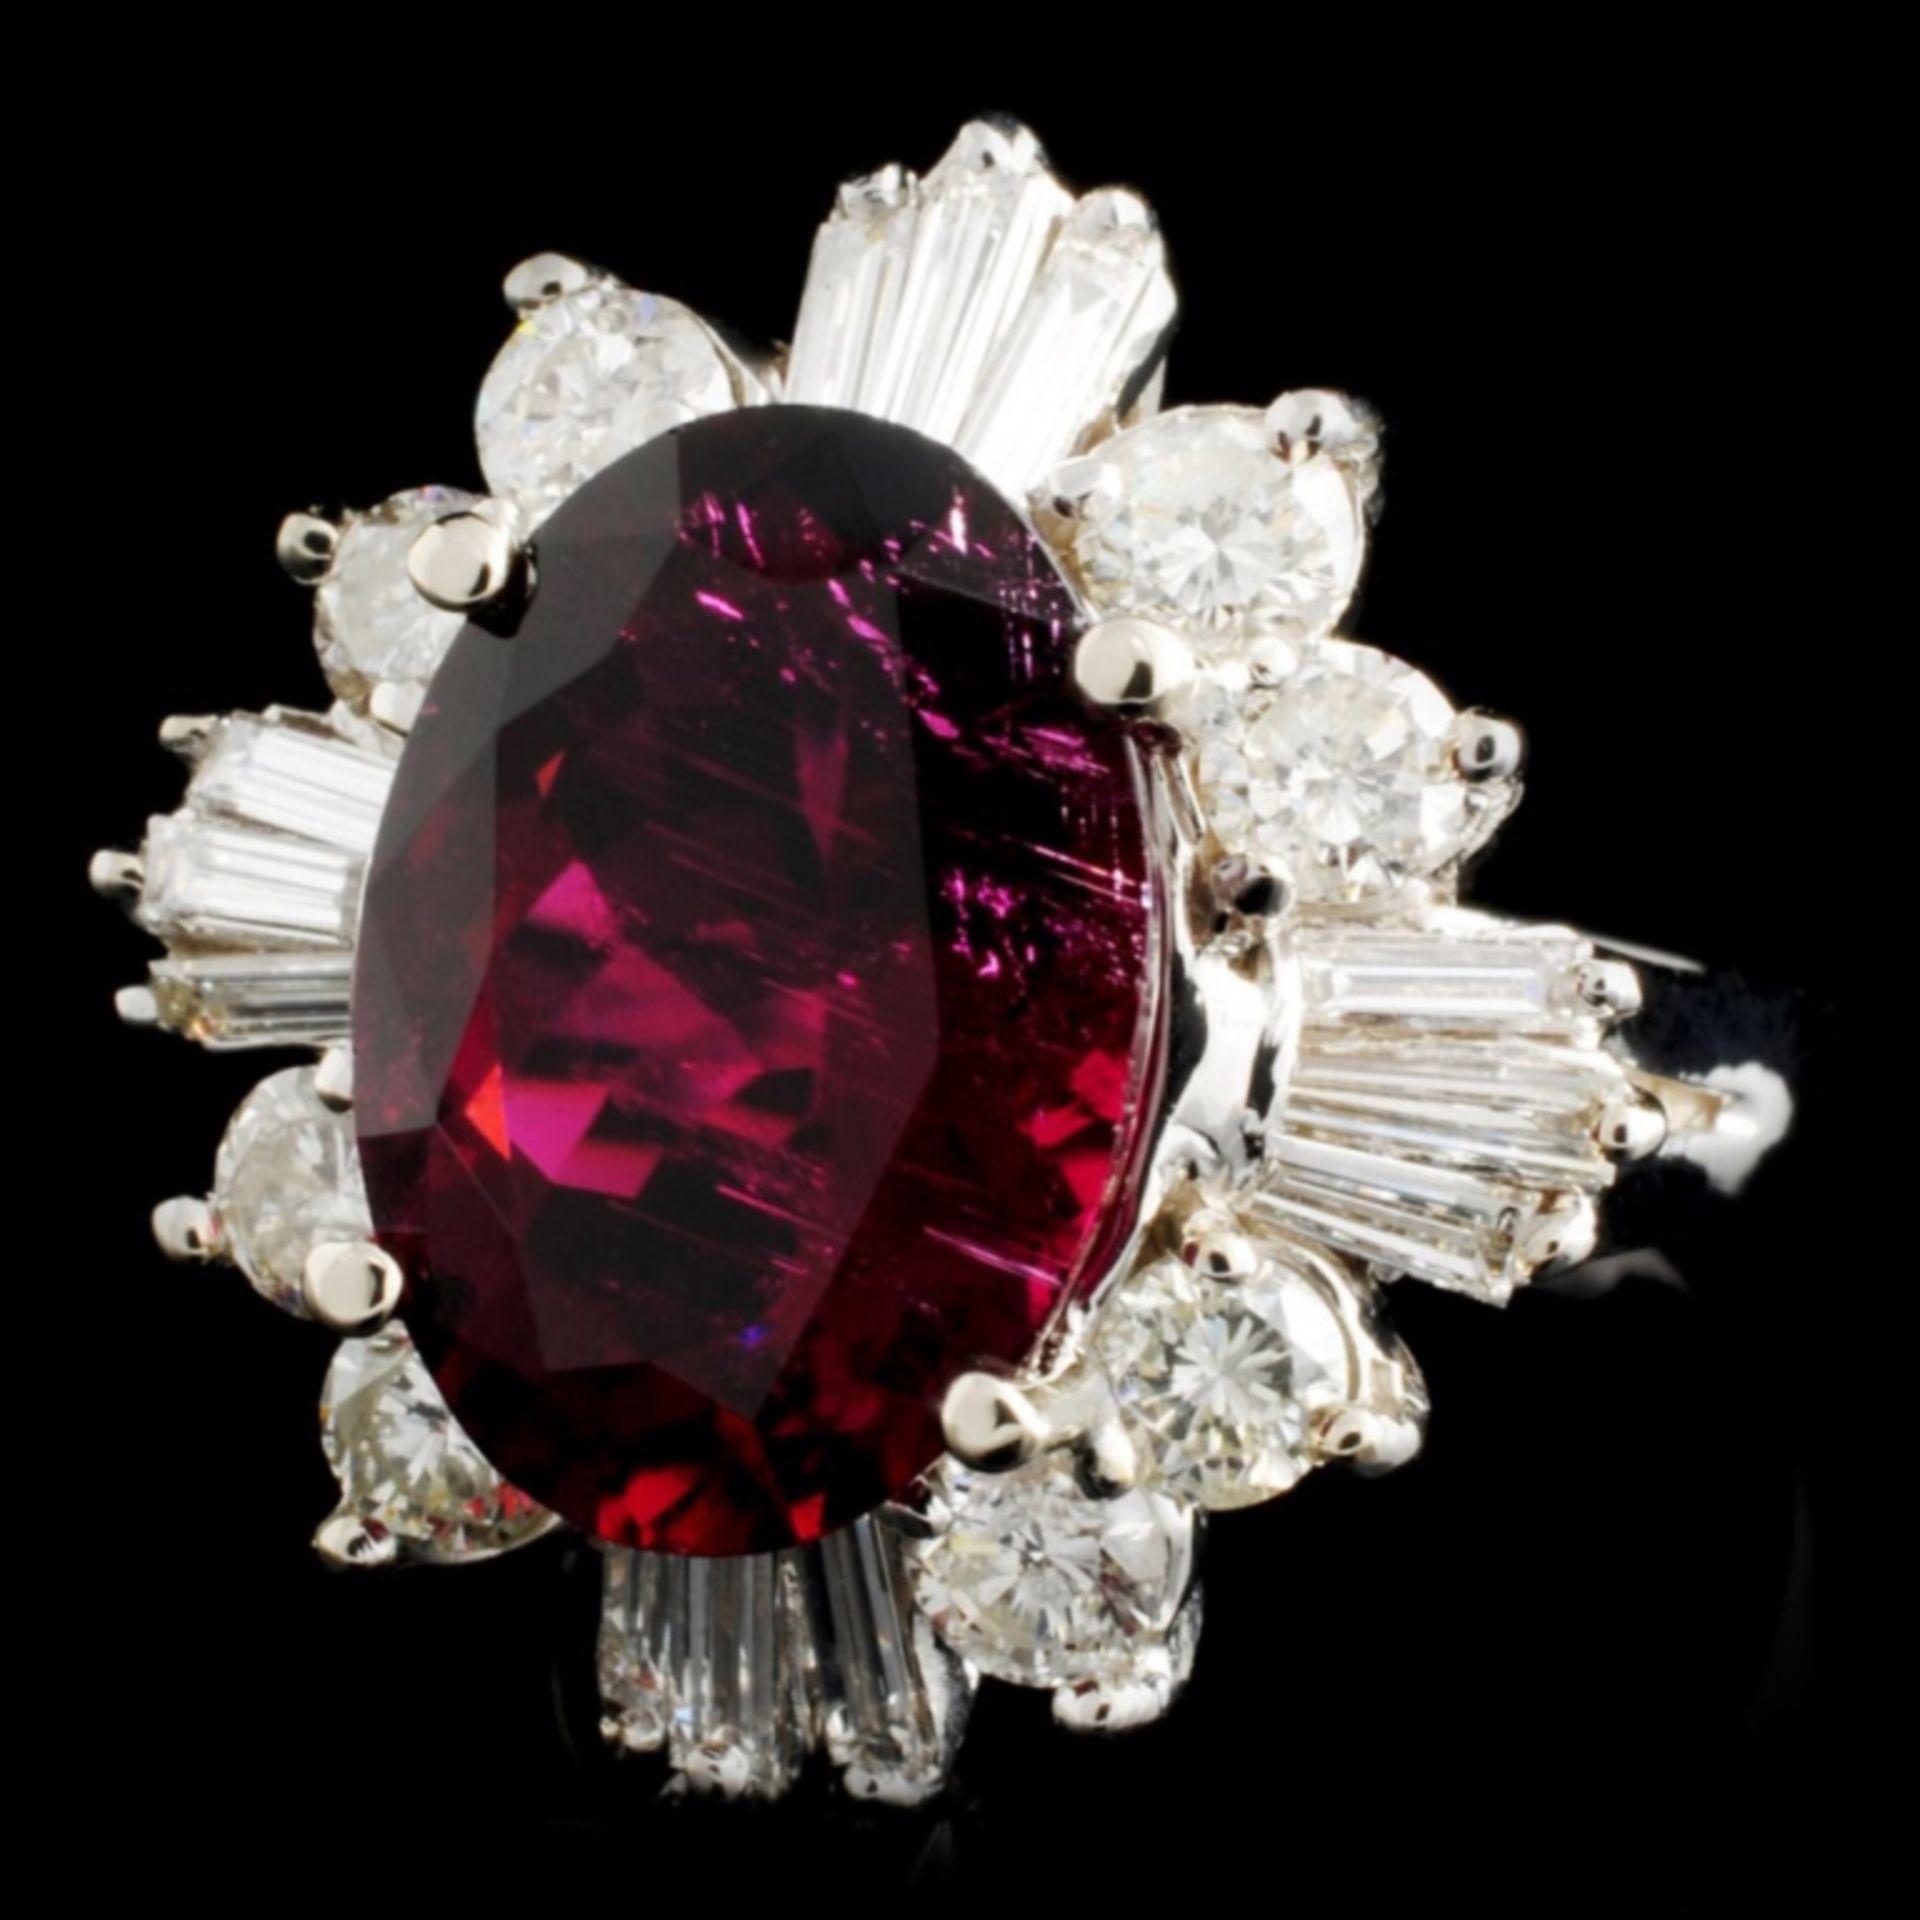 14K Gold 5.46ct Tourmaline & 1.72ctw Diamond Ring - Image 2 of 4